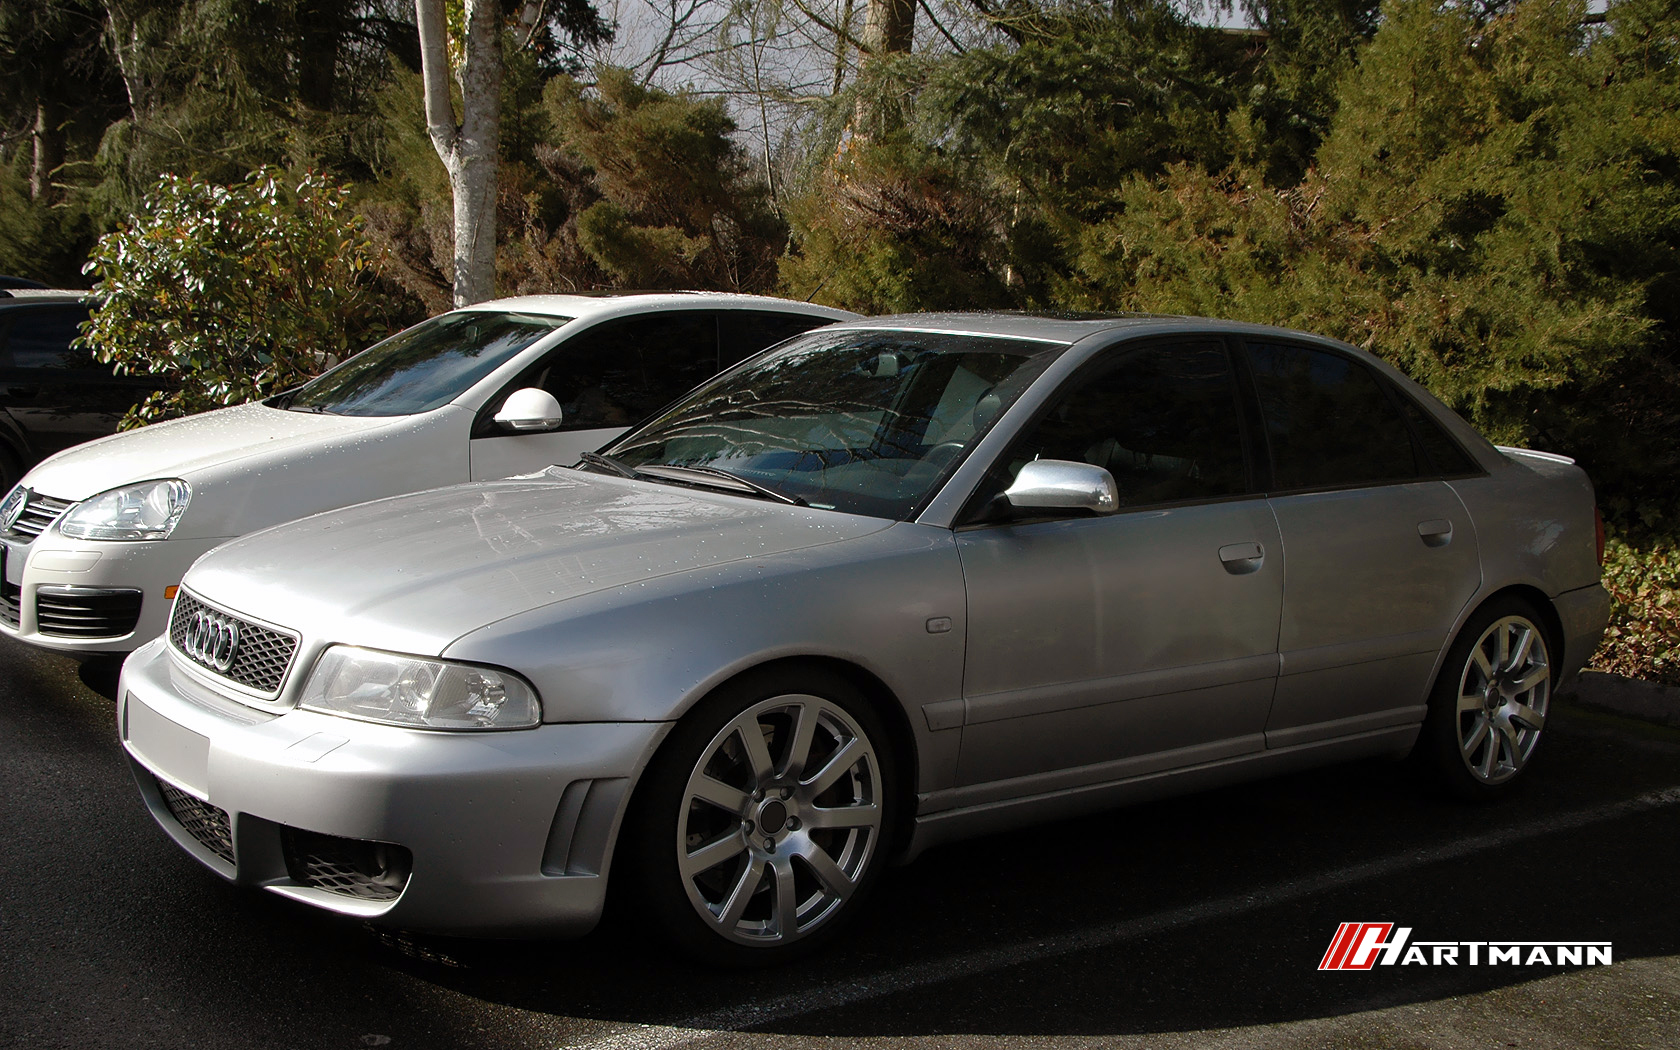 Audi b5 s4 hartman wheels hrs4 dtm gs 18 jr1 hwm